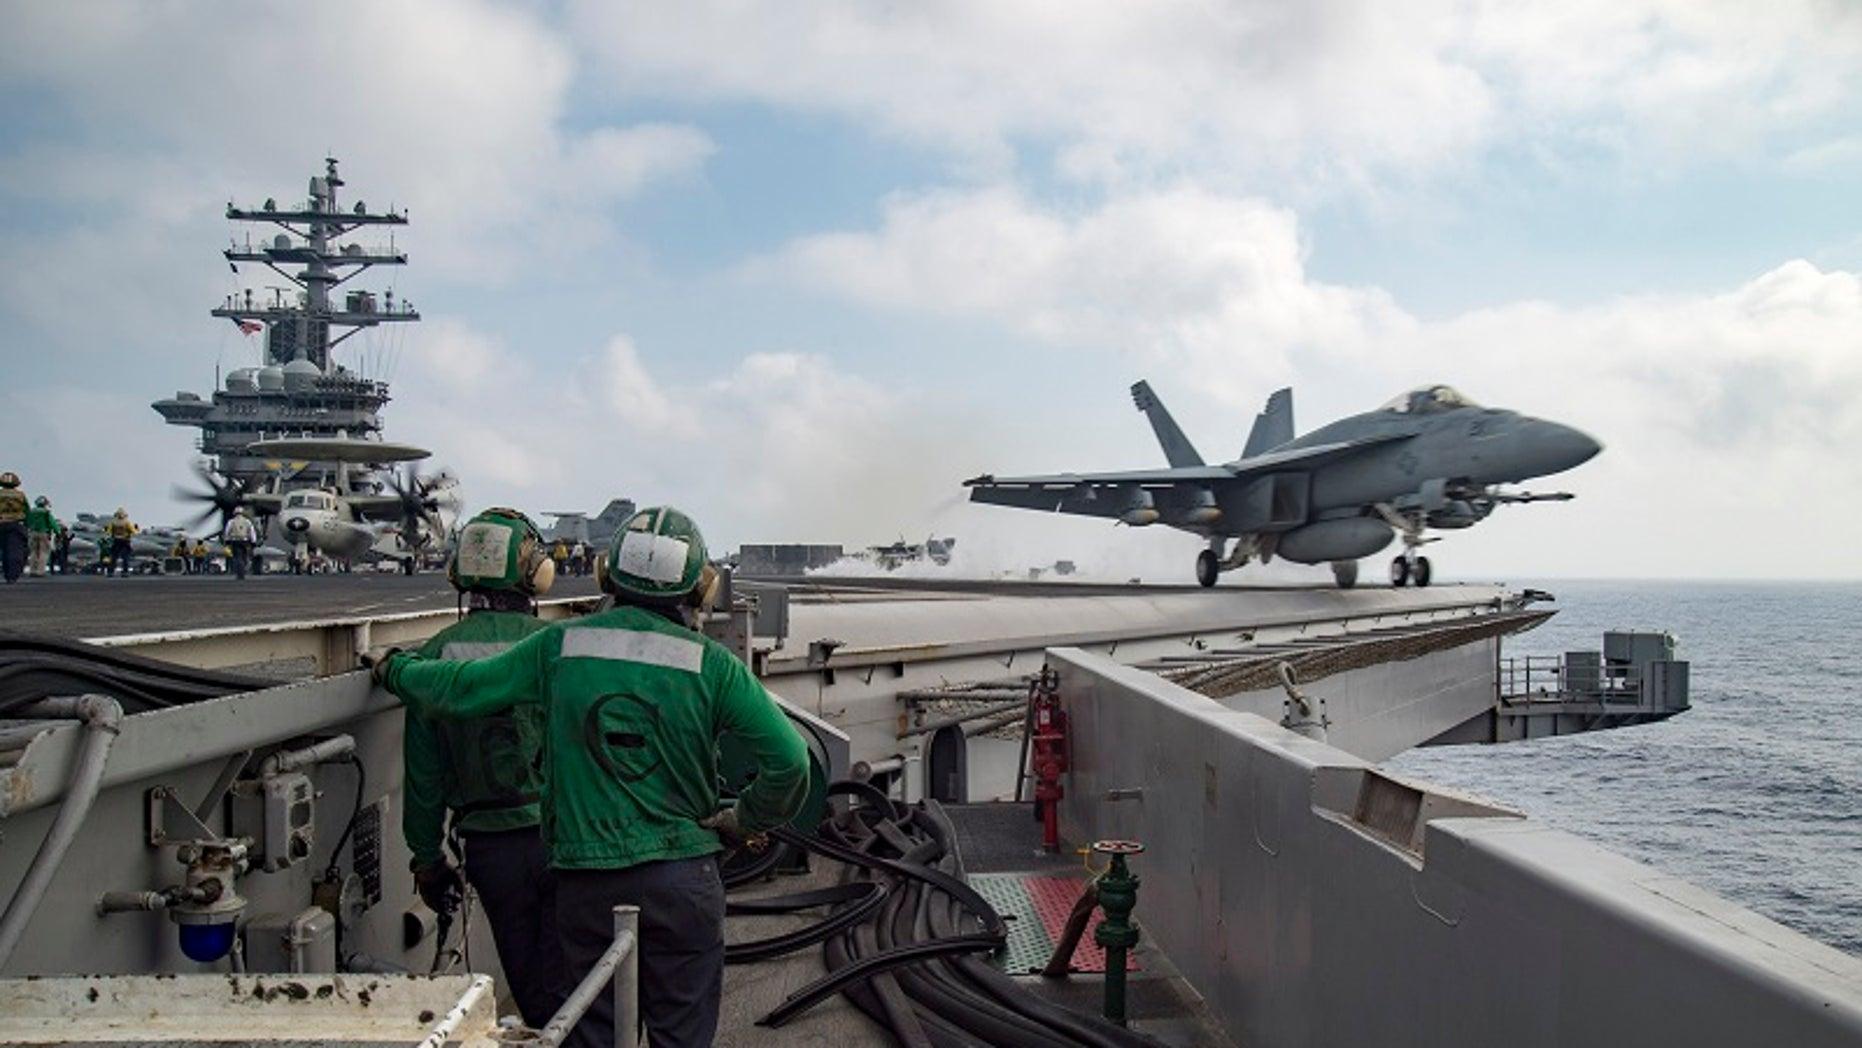 FILE -- A U.S. Navy F/A-18E Super Hornet launches from the flight deck of the aircraft carrier USS Dwight D. Eisenhower (CVN 69) in the Mediterranean Sea June 28, 2016.